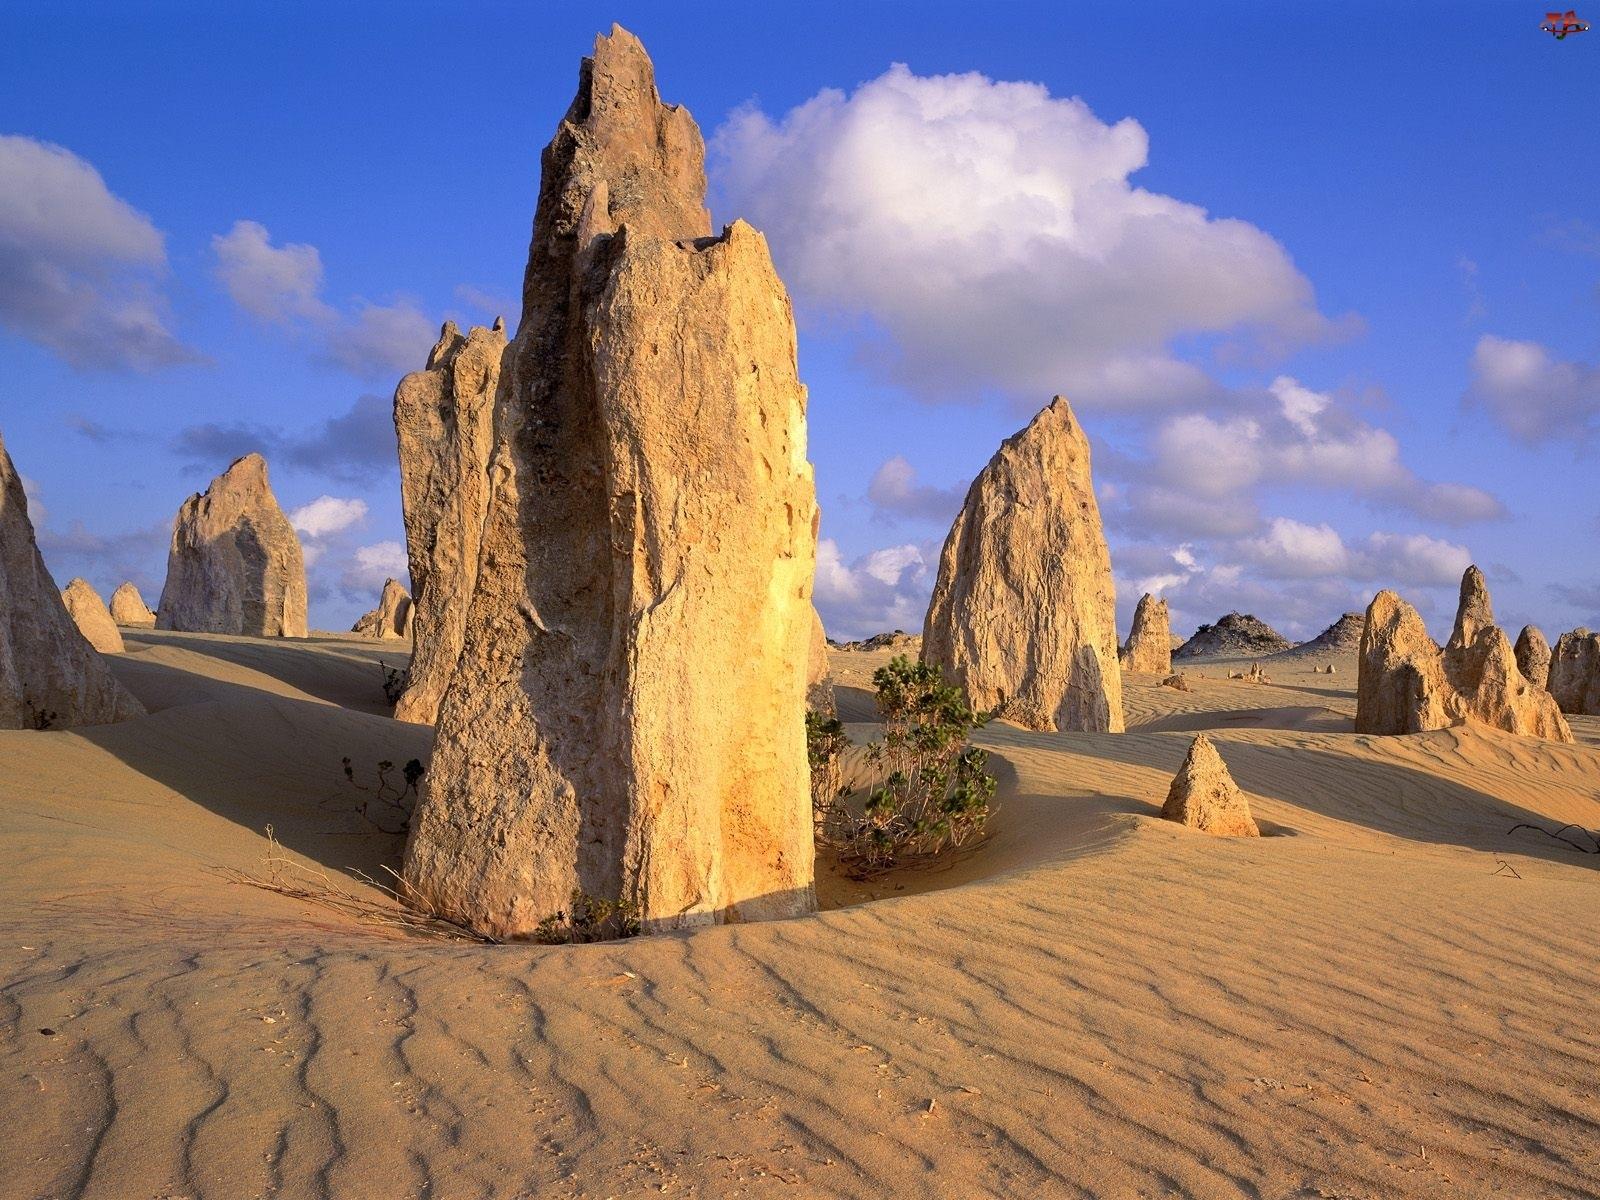 Australia, Pinnacles Desert, Nambung National Park